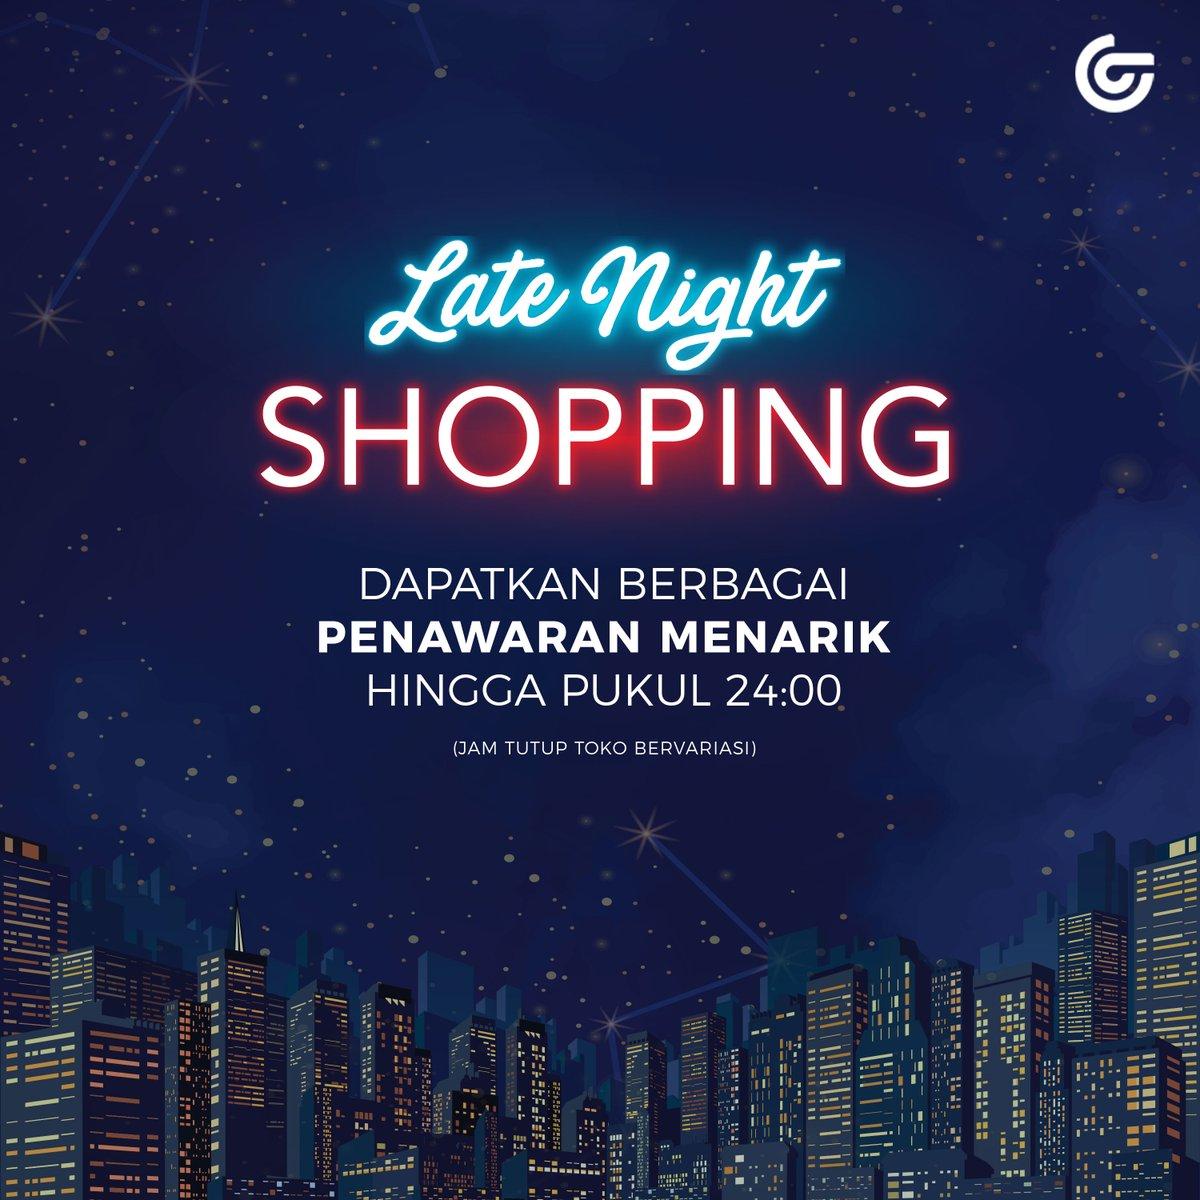 #Matahari - Promo Late Night Shopping (HARI INI - s.d 24:00)